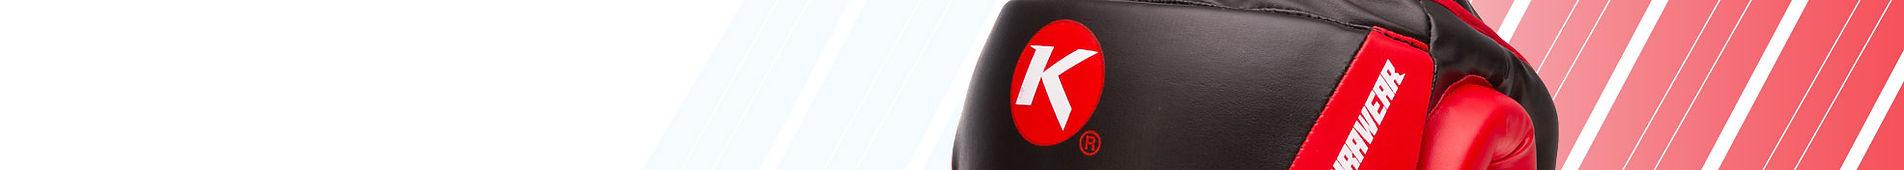 Head-Gear-Banner.jpg